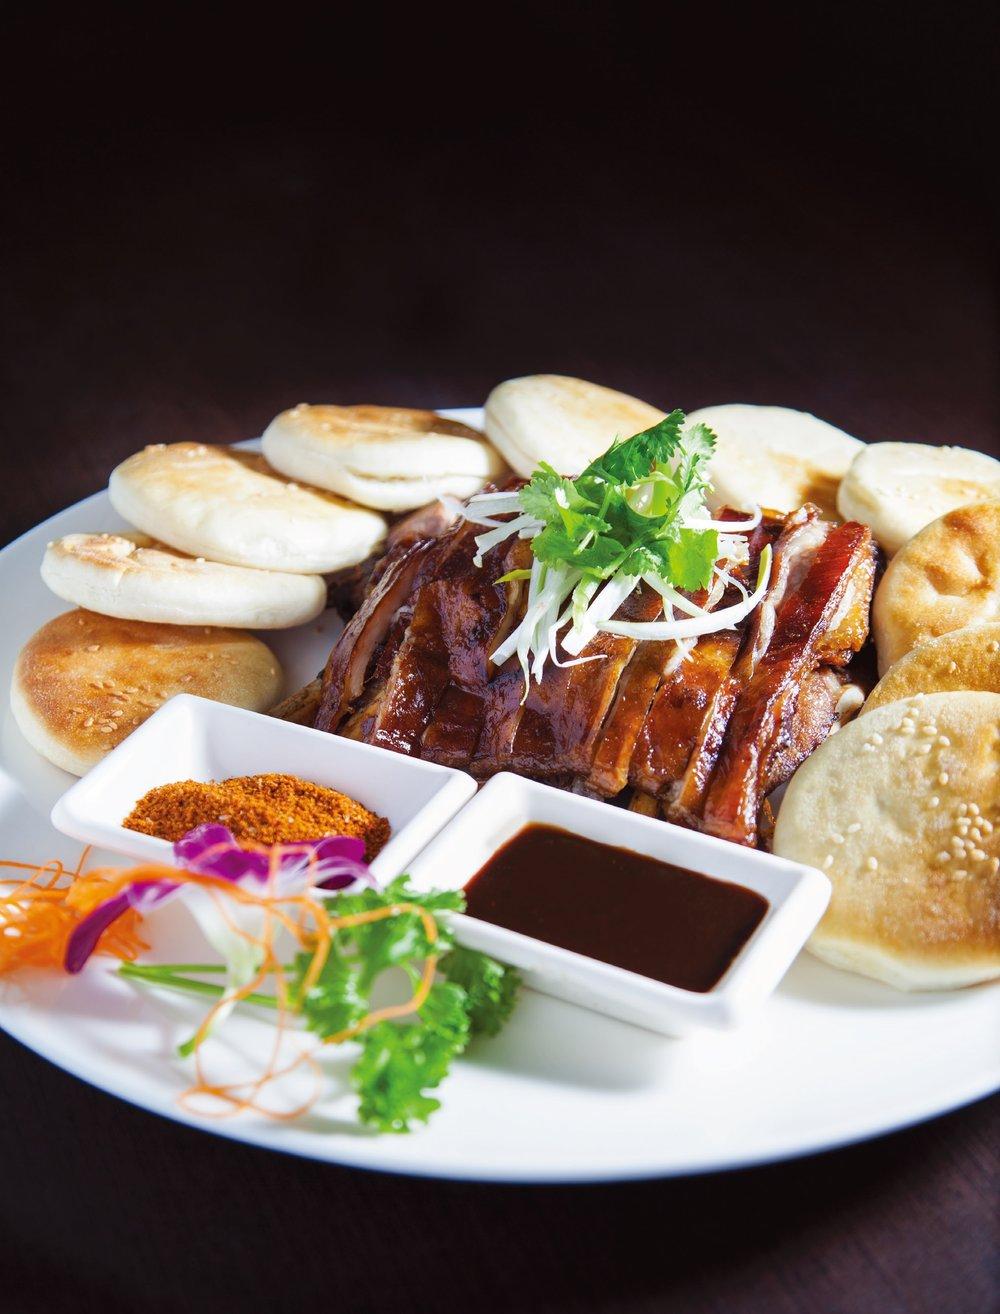 Xinjiang style lamb